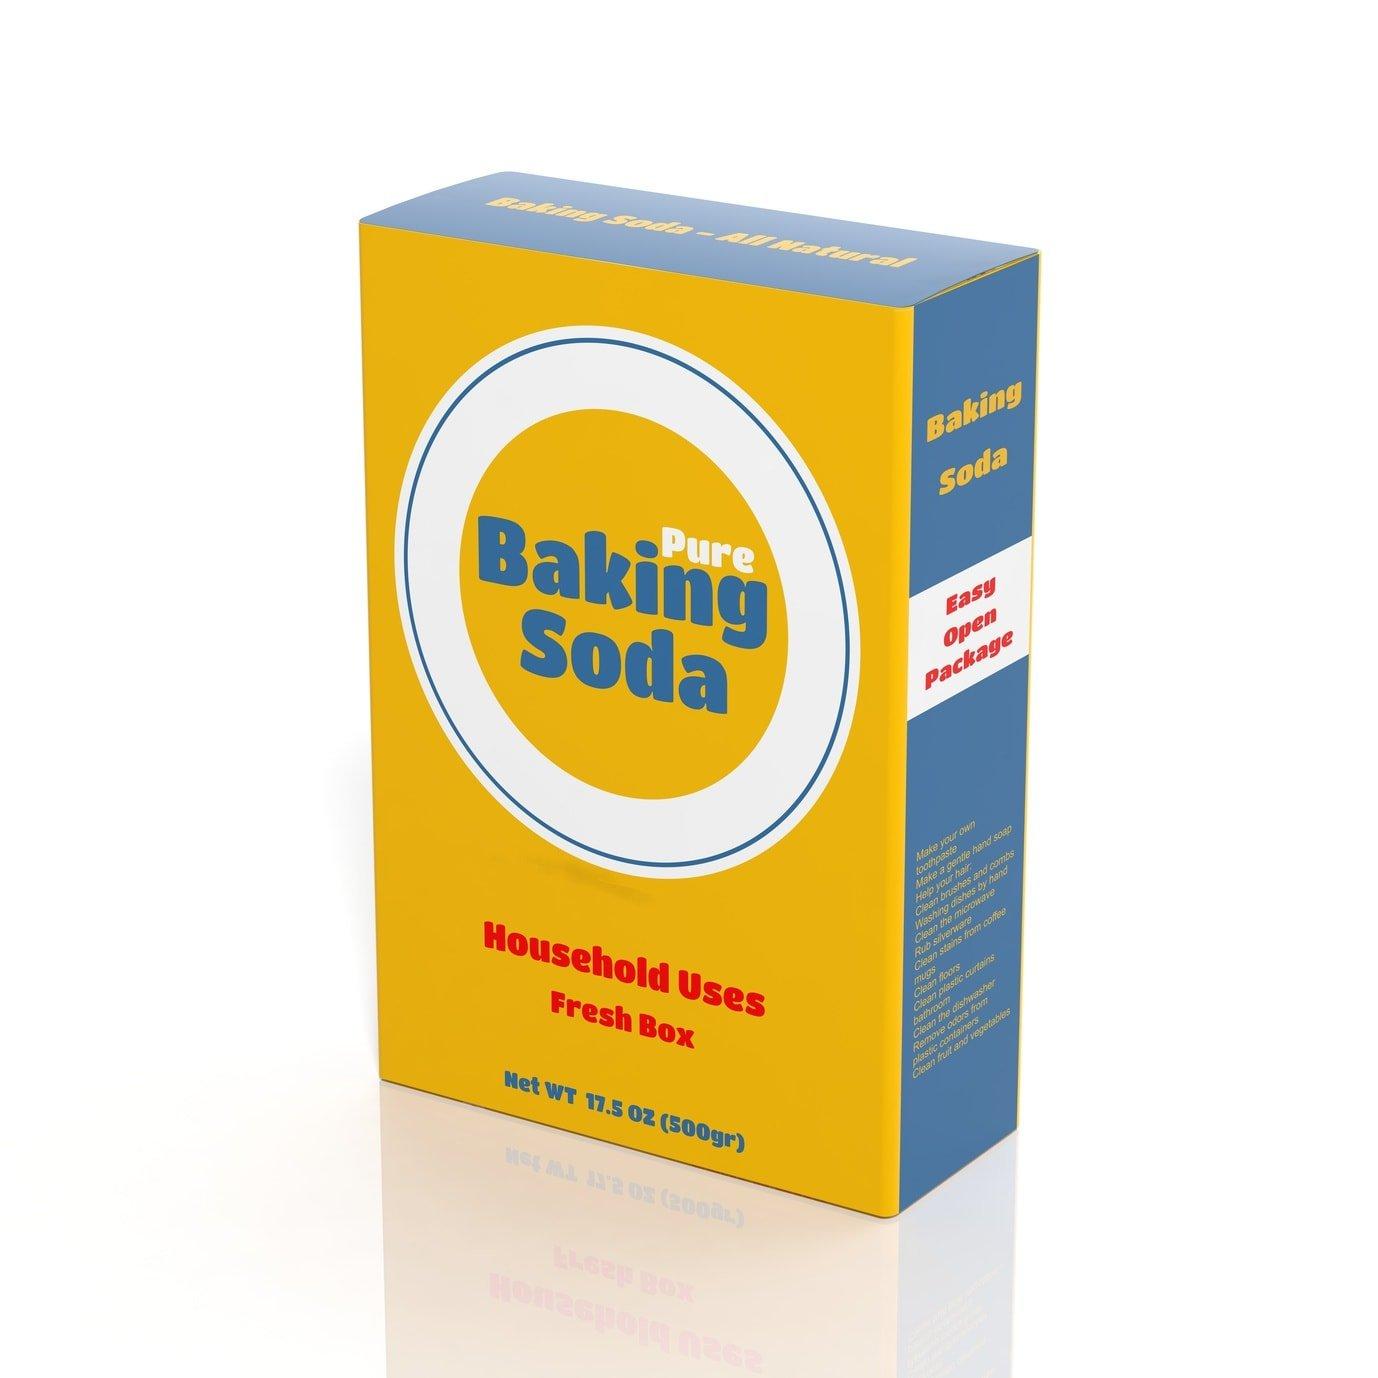 baking soda uses - box of baking soda